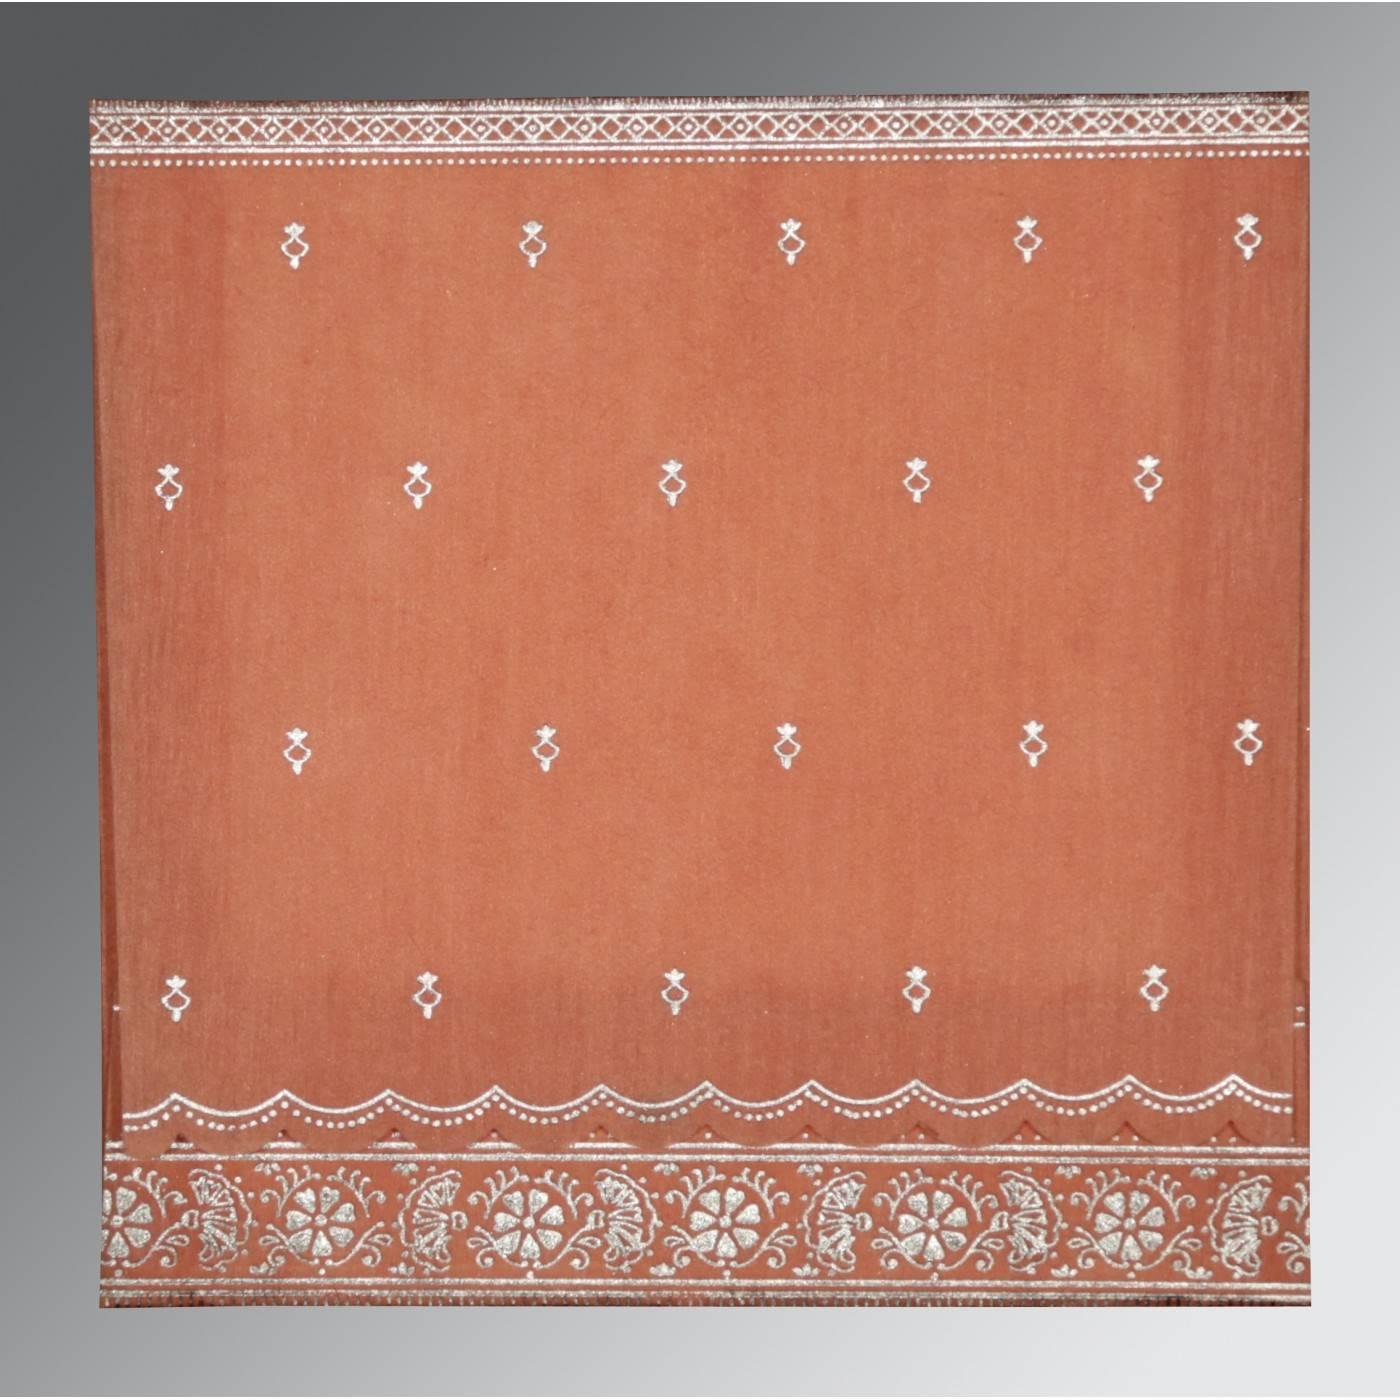 CORAL WOOLY FOIL STAMPED WEDDING CARD : CRU-8242L - IndianWeddingCards